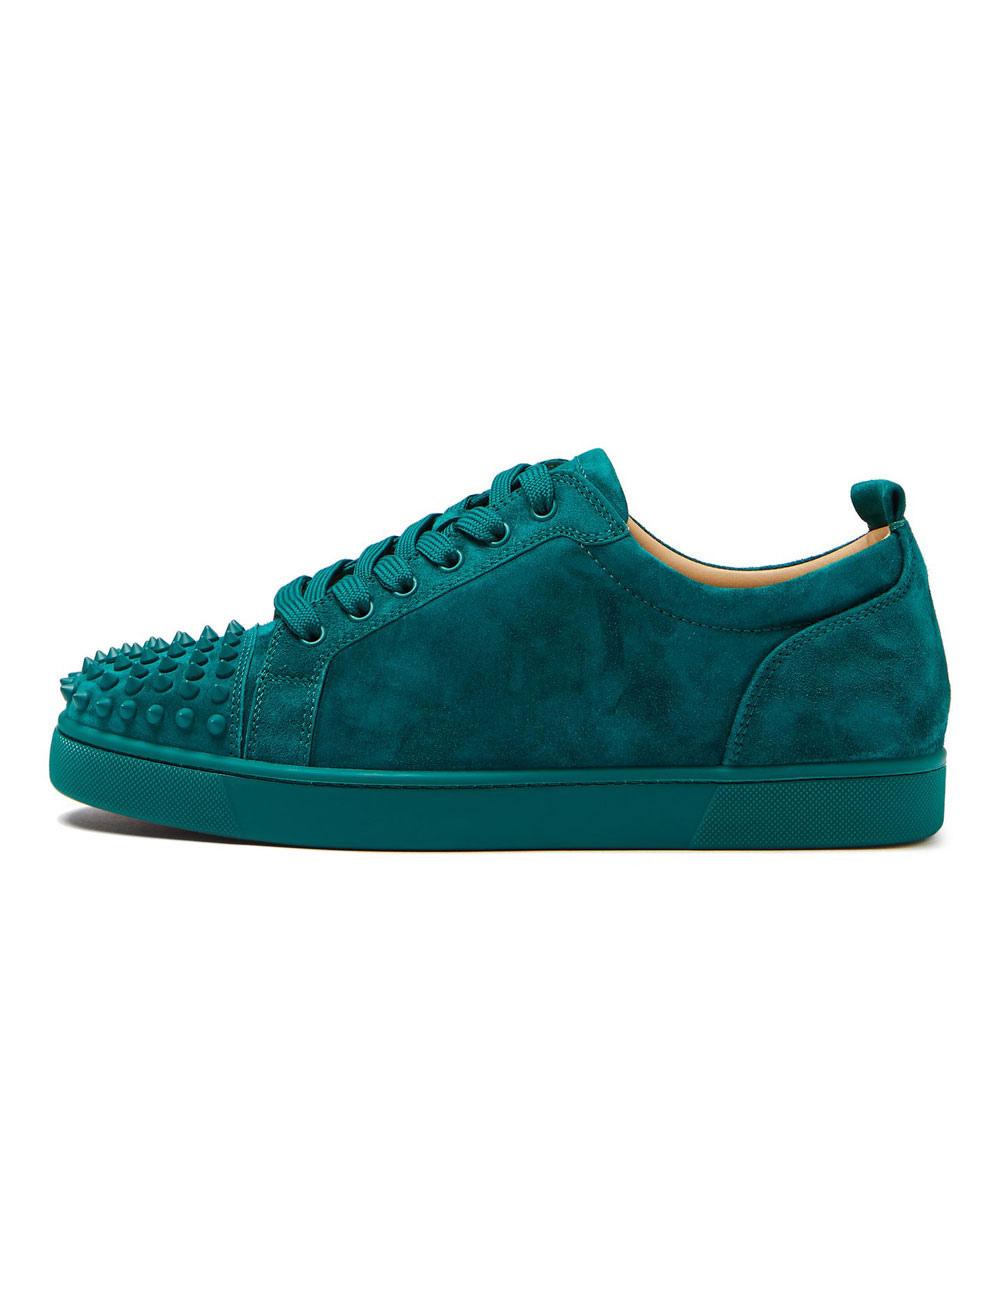 Mens Sneakers 2021 Dark Green Round Toe